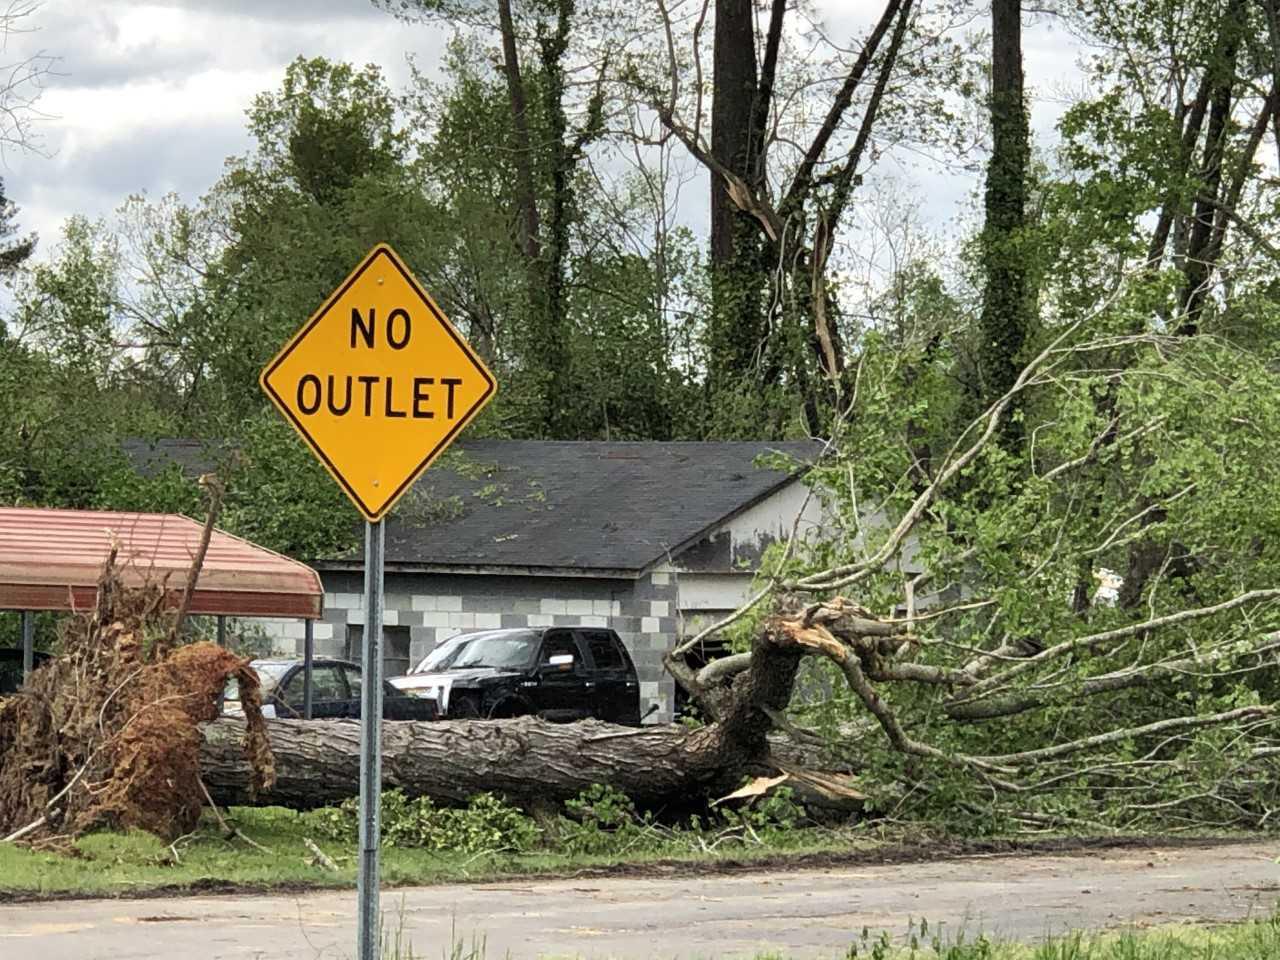 Siler City tornado damage 6_1555776785872.jpg-873704001.jpg